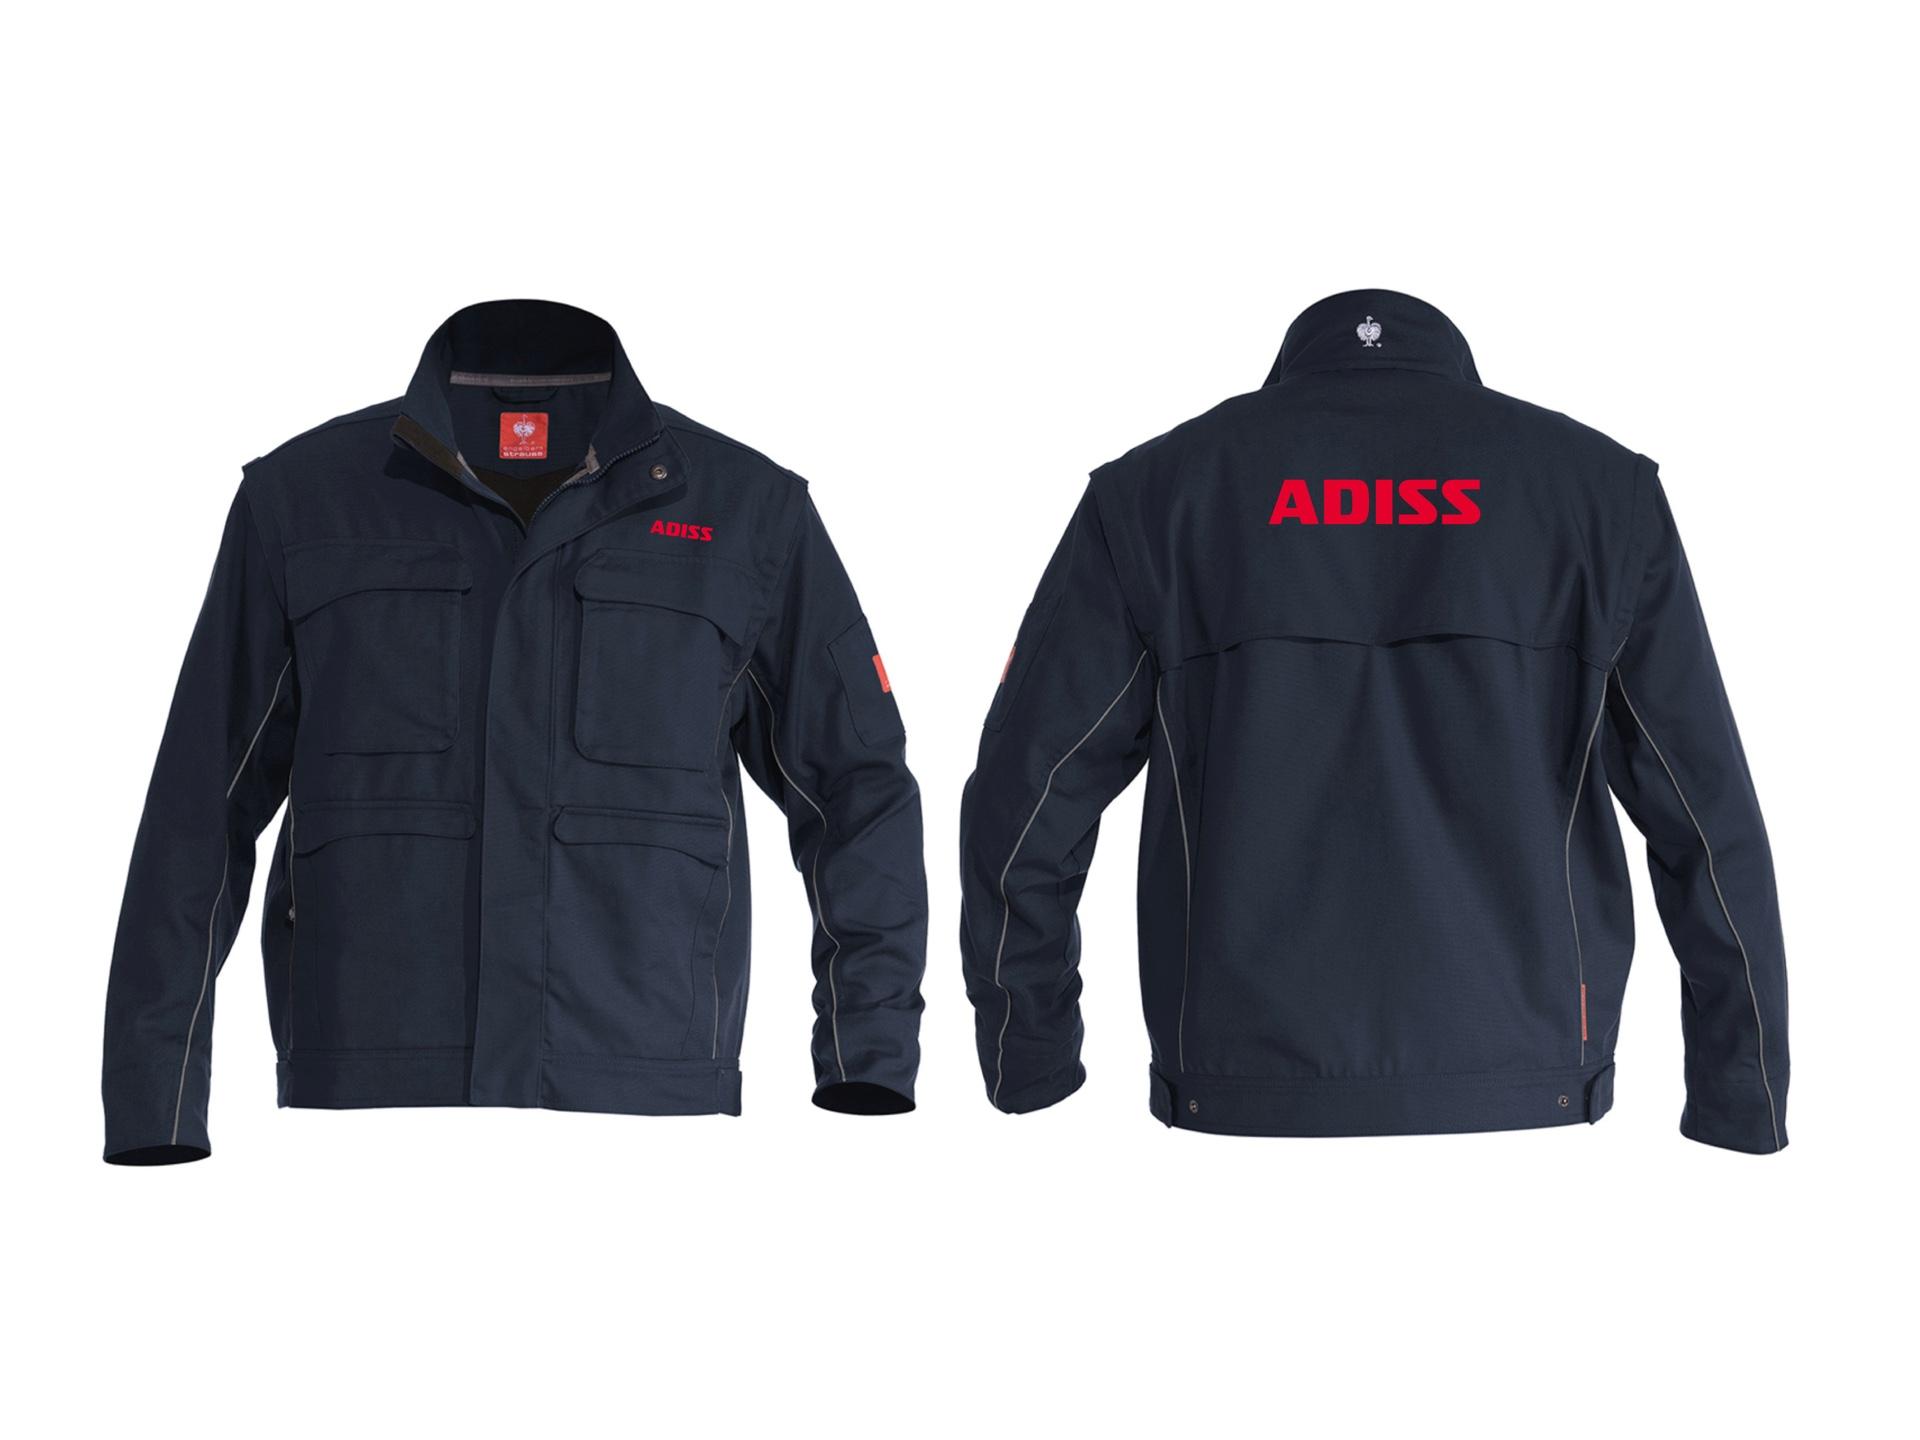 Adiss workwear 02.jpg